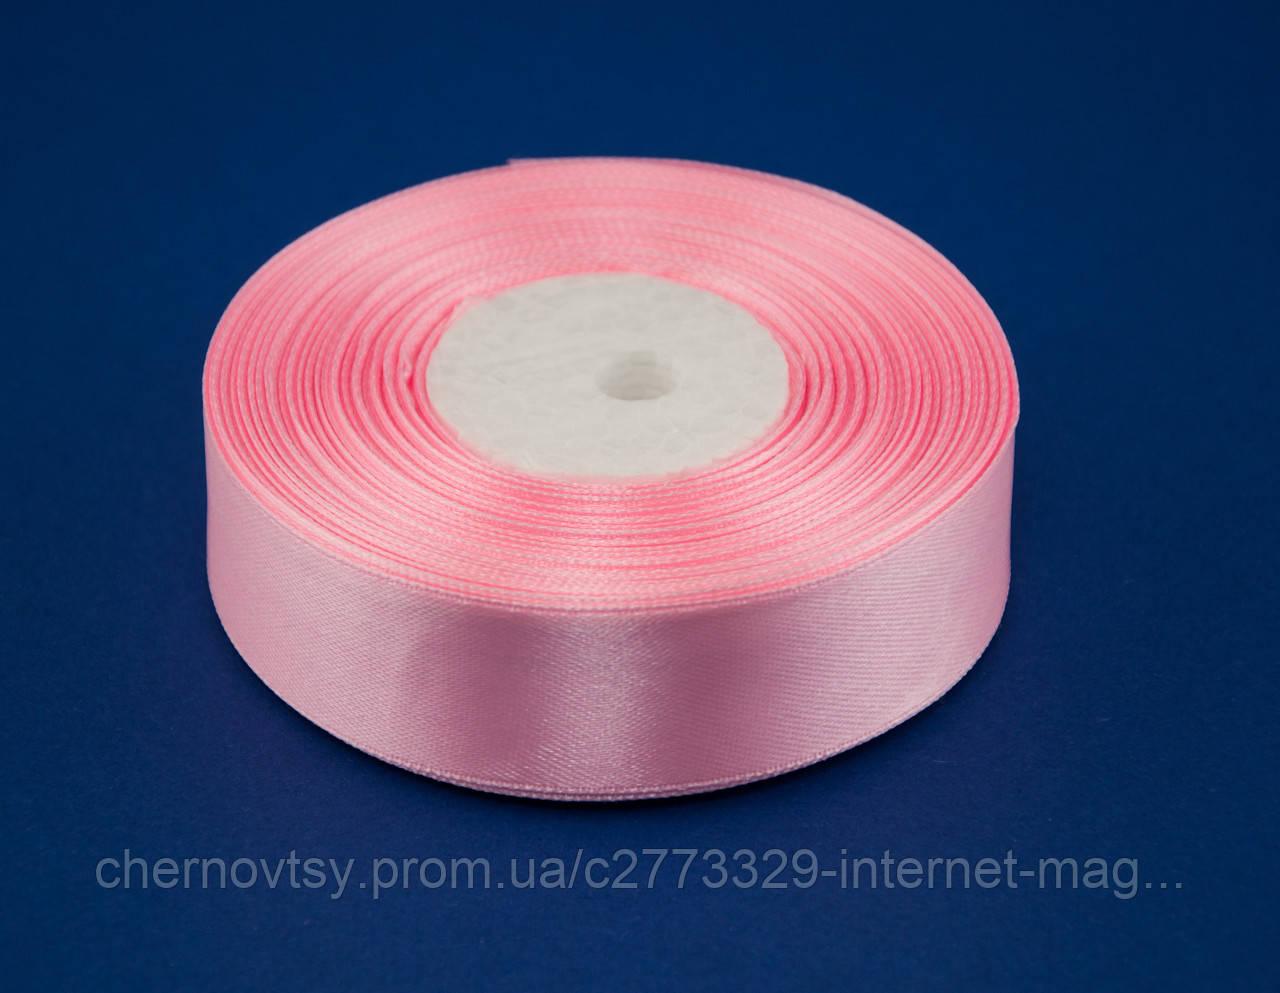 Лента атлас 0.6 см, 33 м, № 04 Нежно розовая